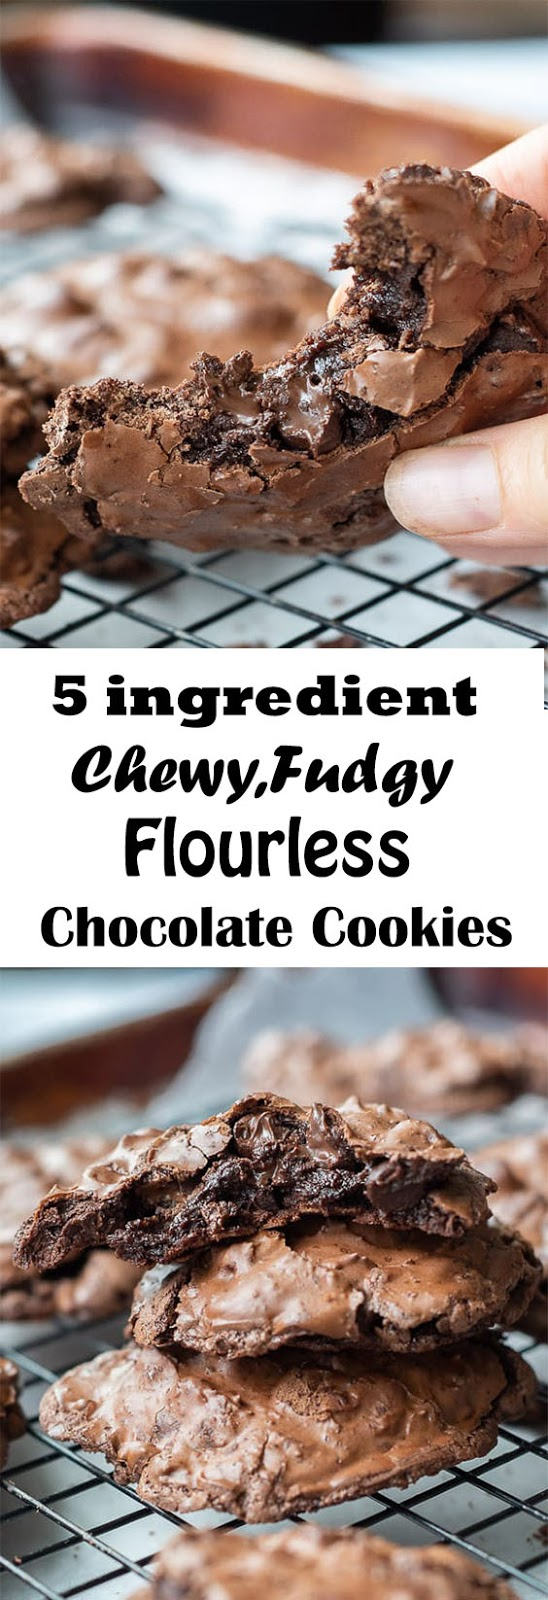 Chewy,Fudgy Flourless Chocolate Cookies